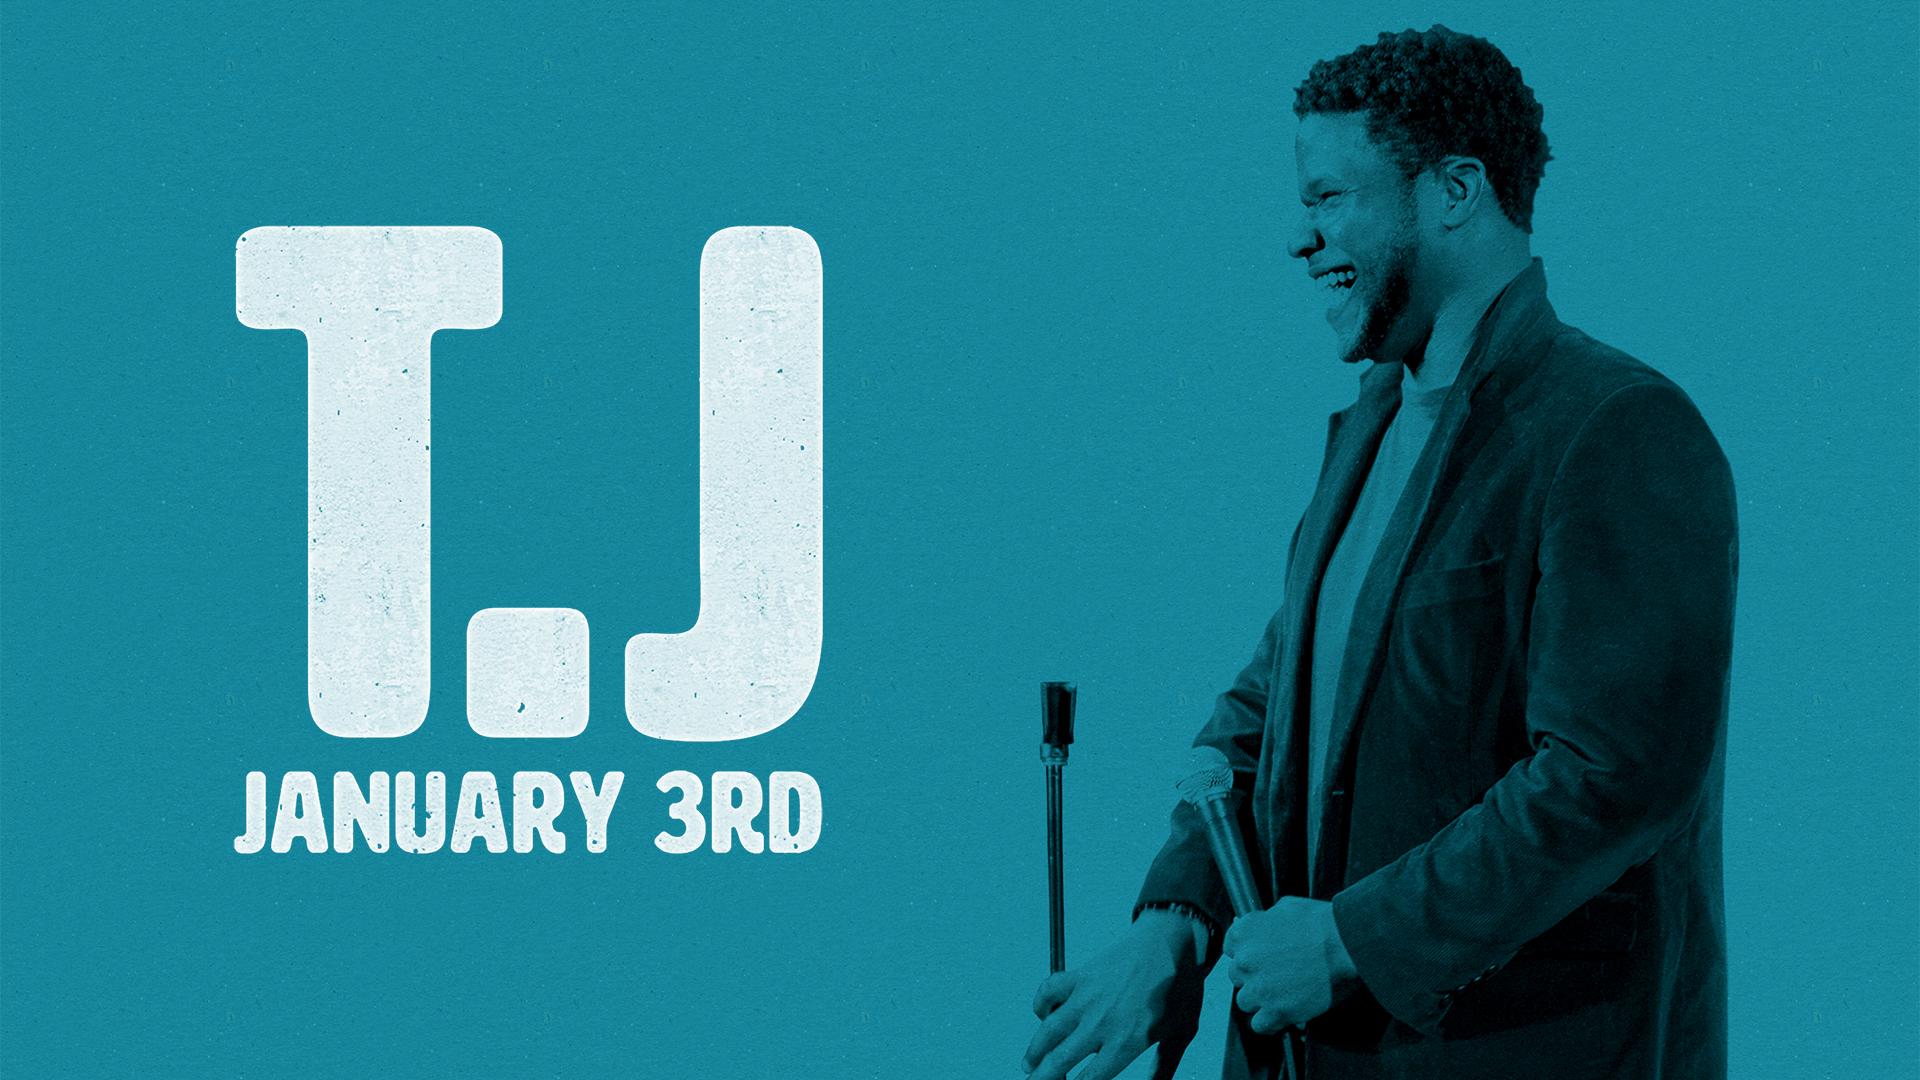 TJ: January 3rd